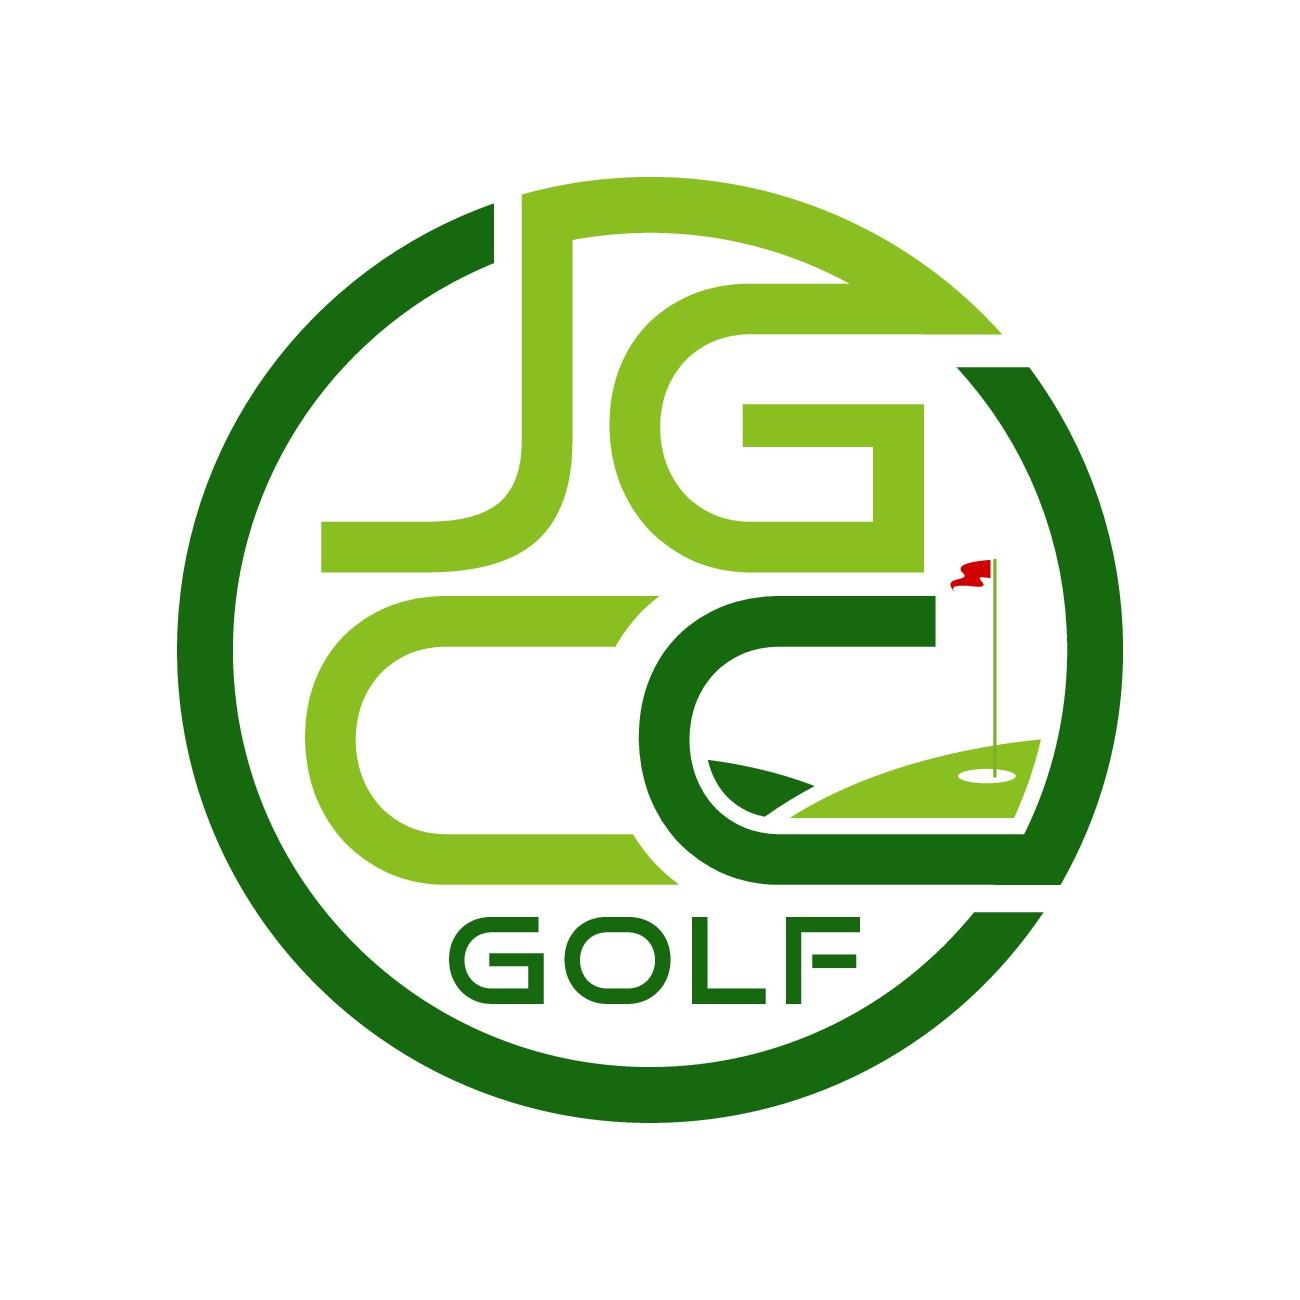 JGCC Golf